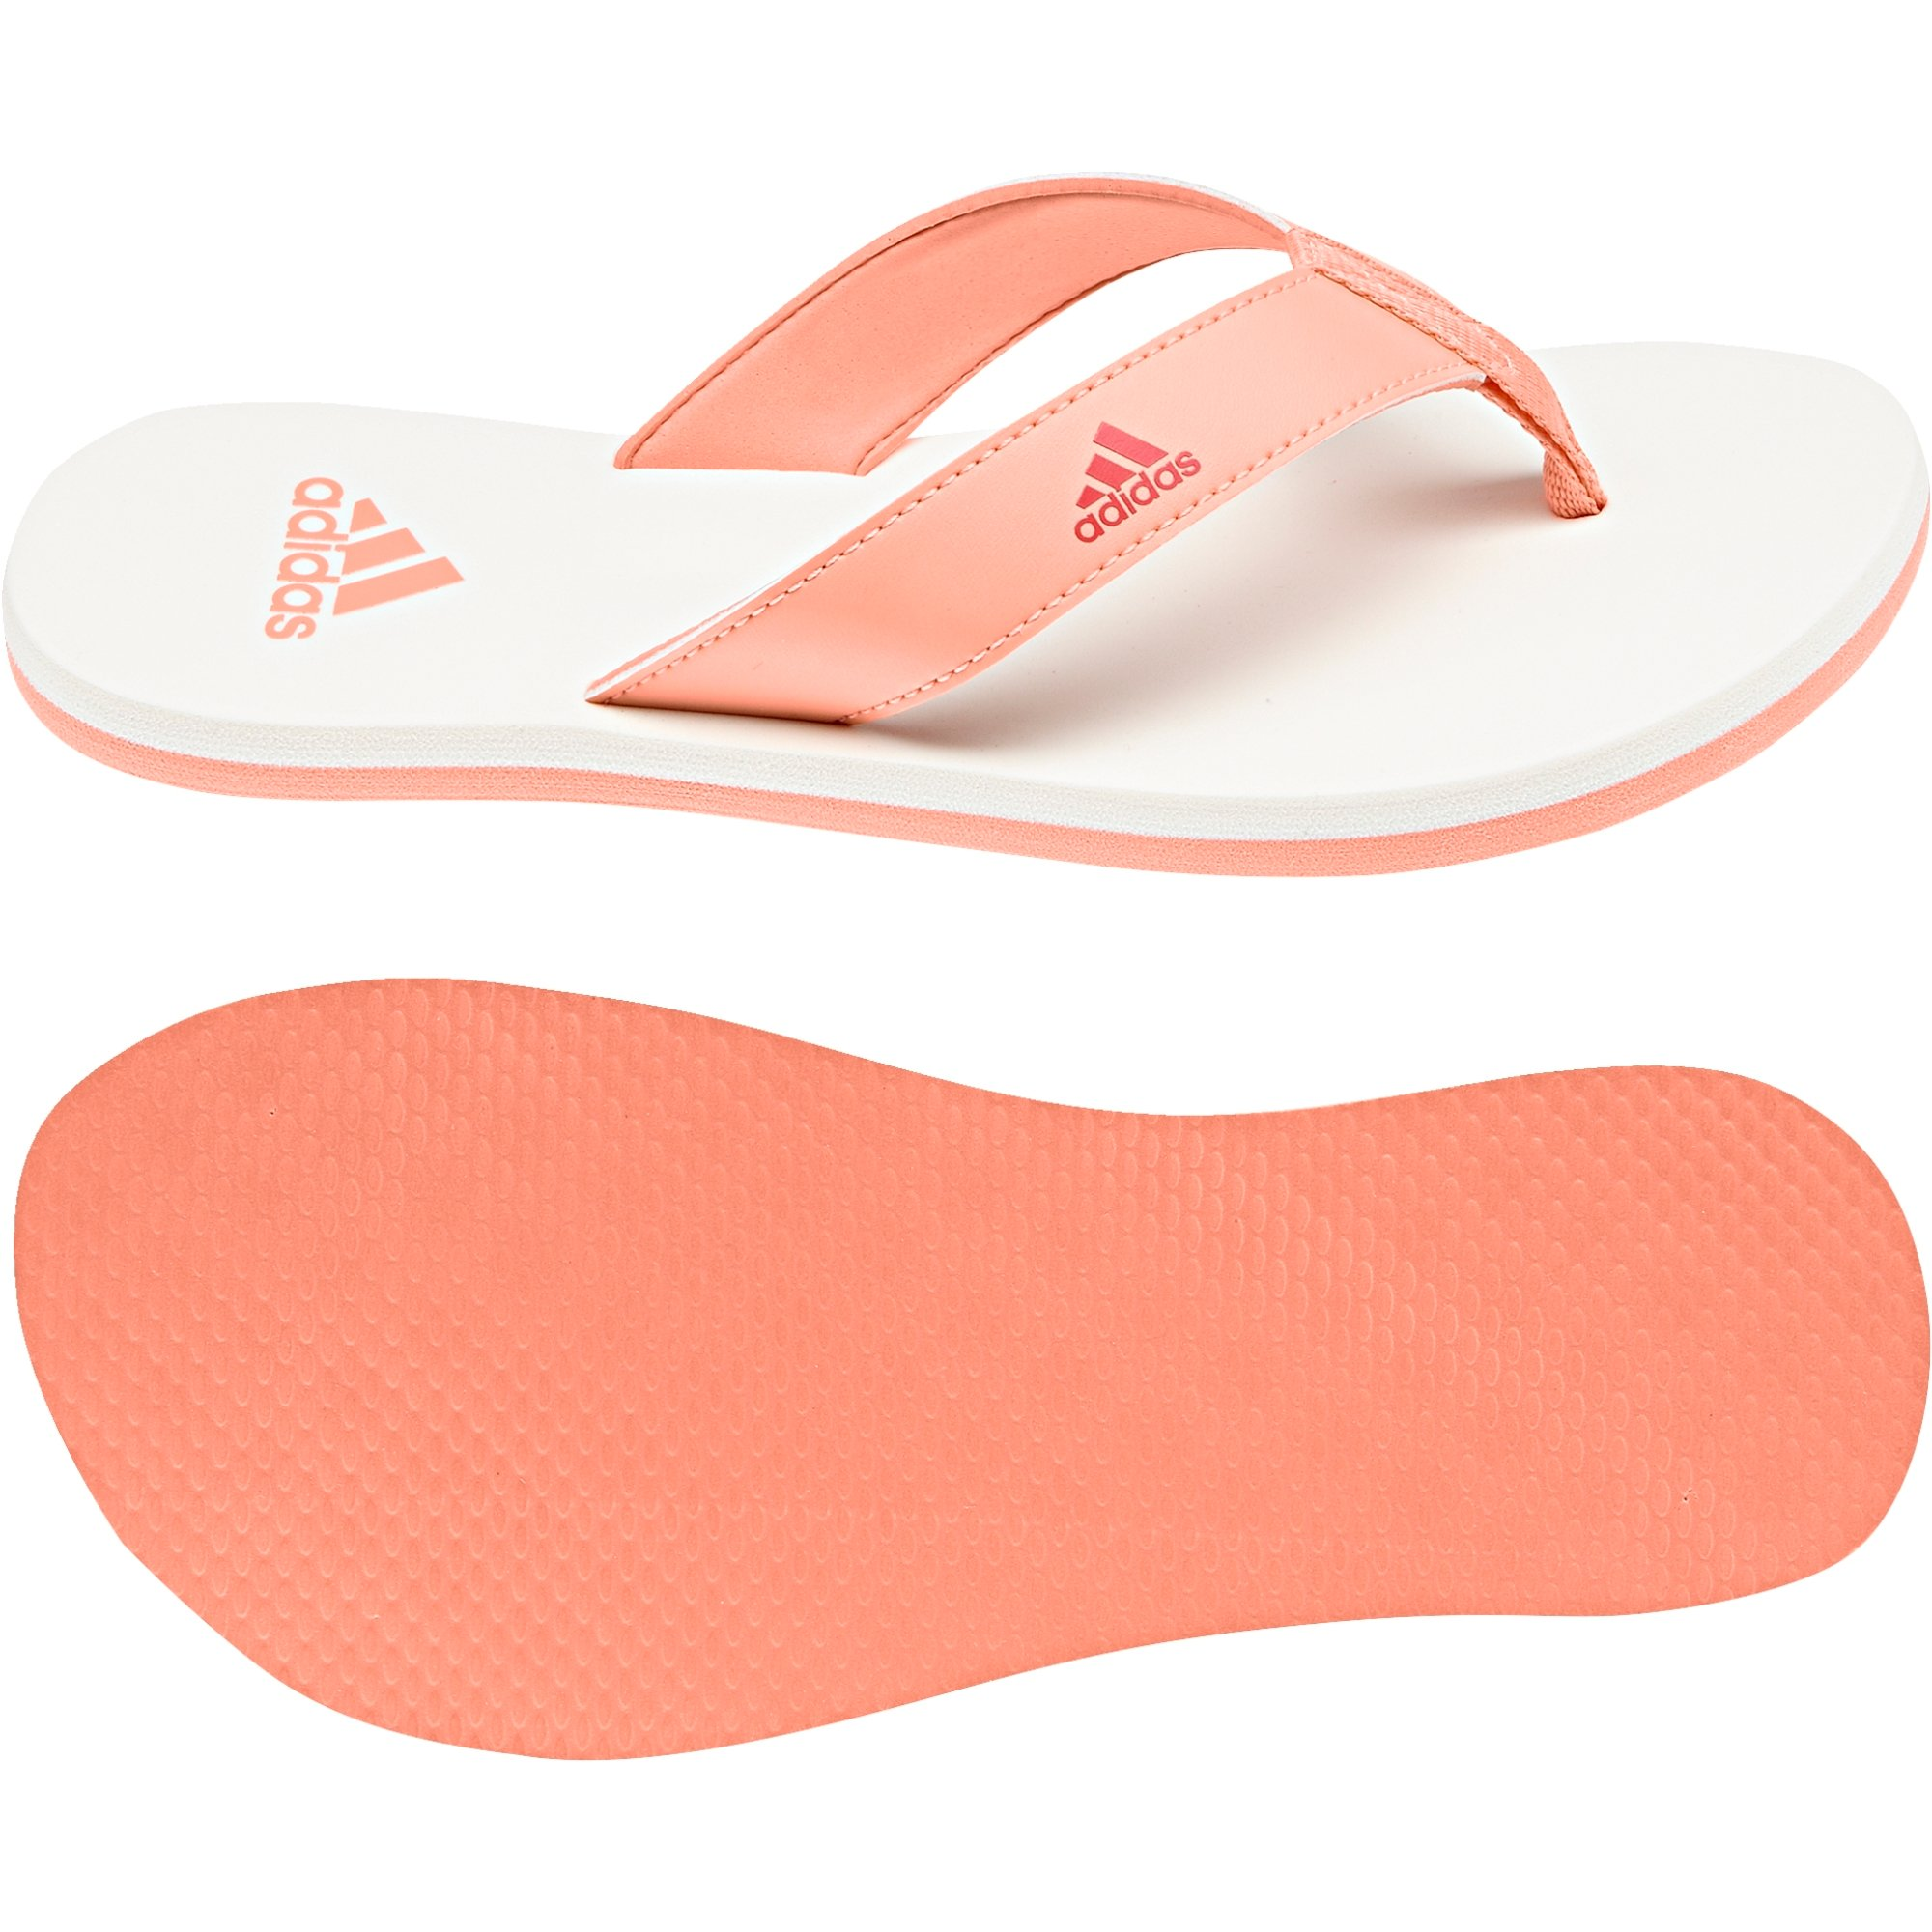 differently 1b9c9 1cb3f japonki damskie adidas Beach Thong r 6 CP9379